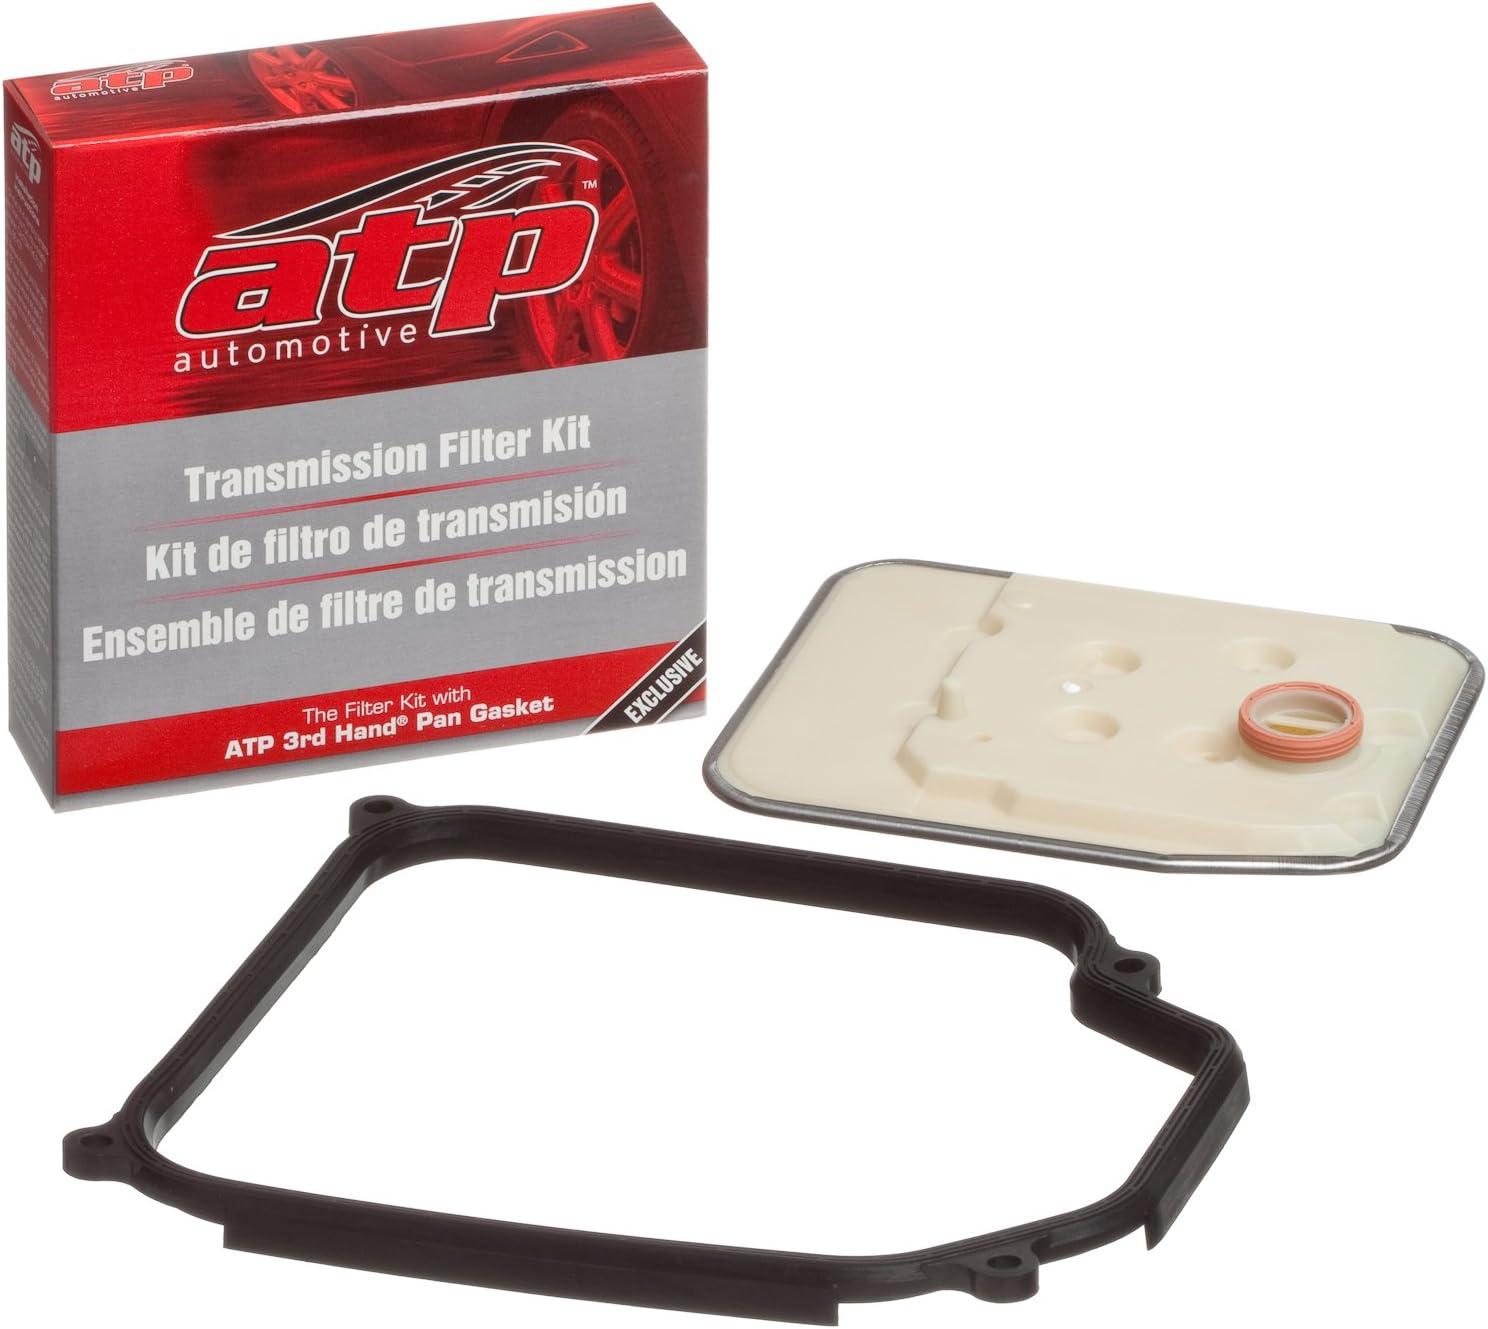 ATP TF-216 Automatic Transmission Filter Kit